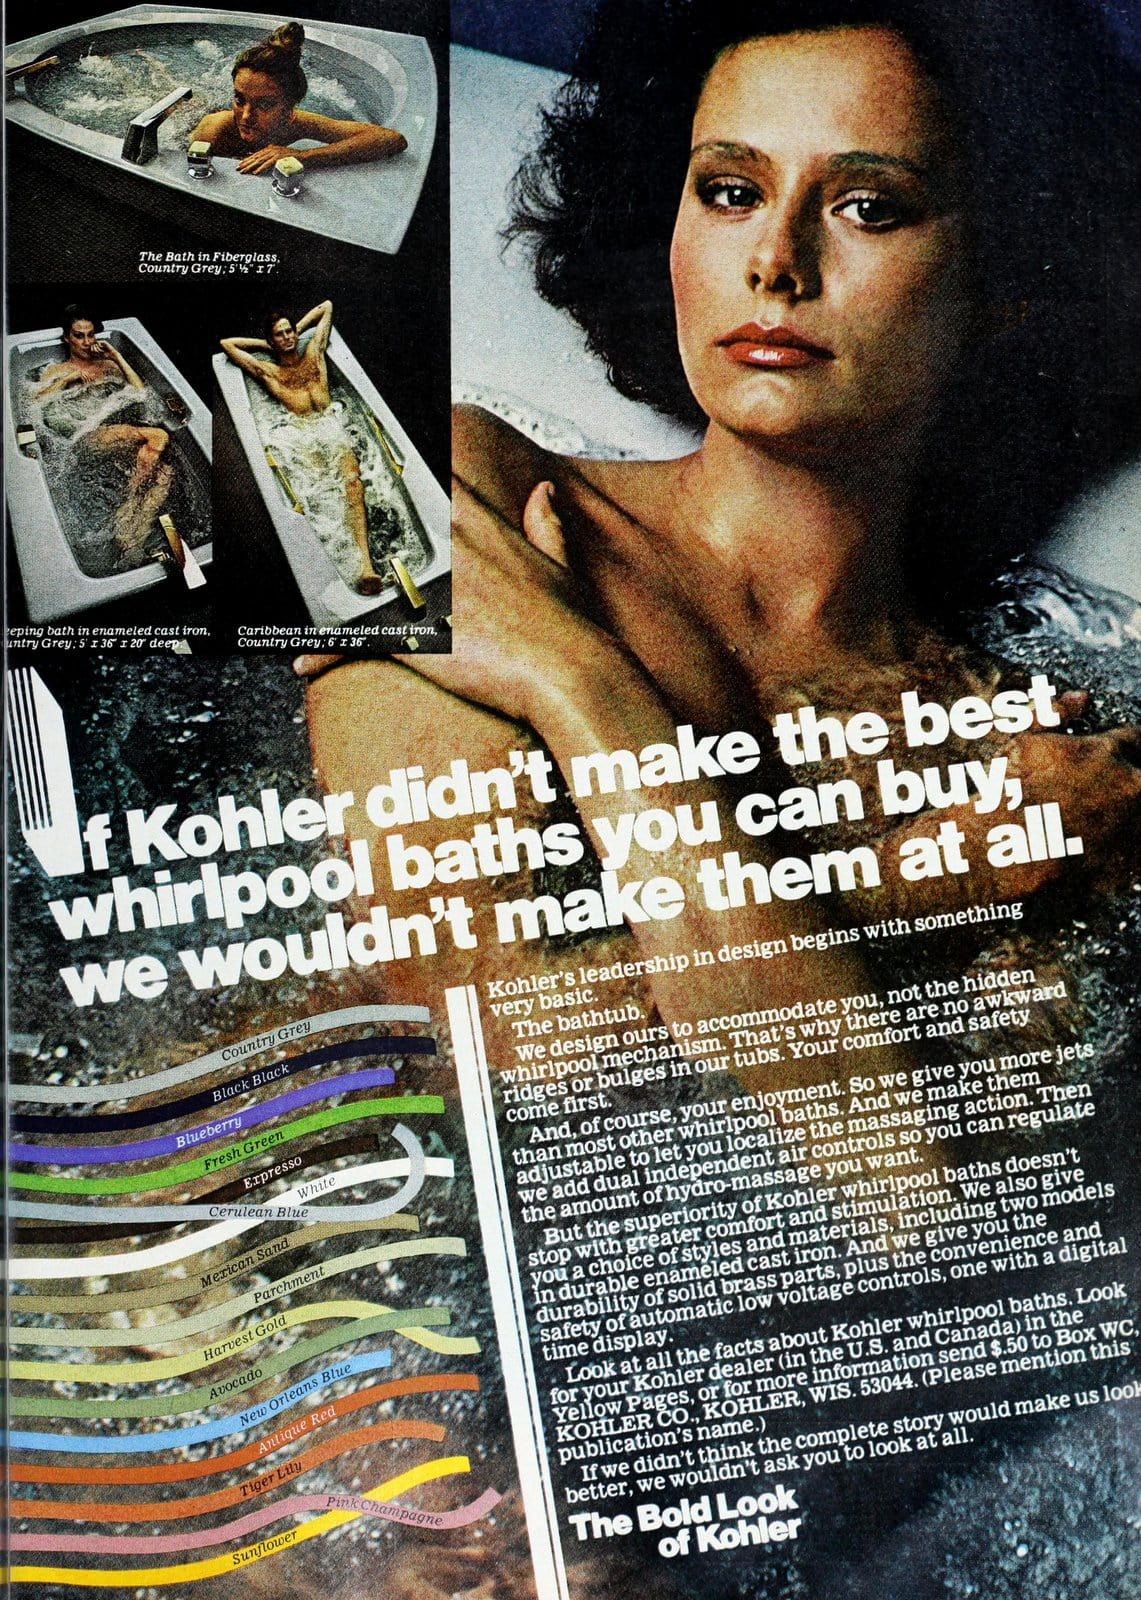 Home decor - Colorful Kohler whirlpool baths (1978)